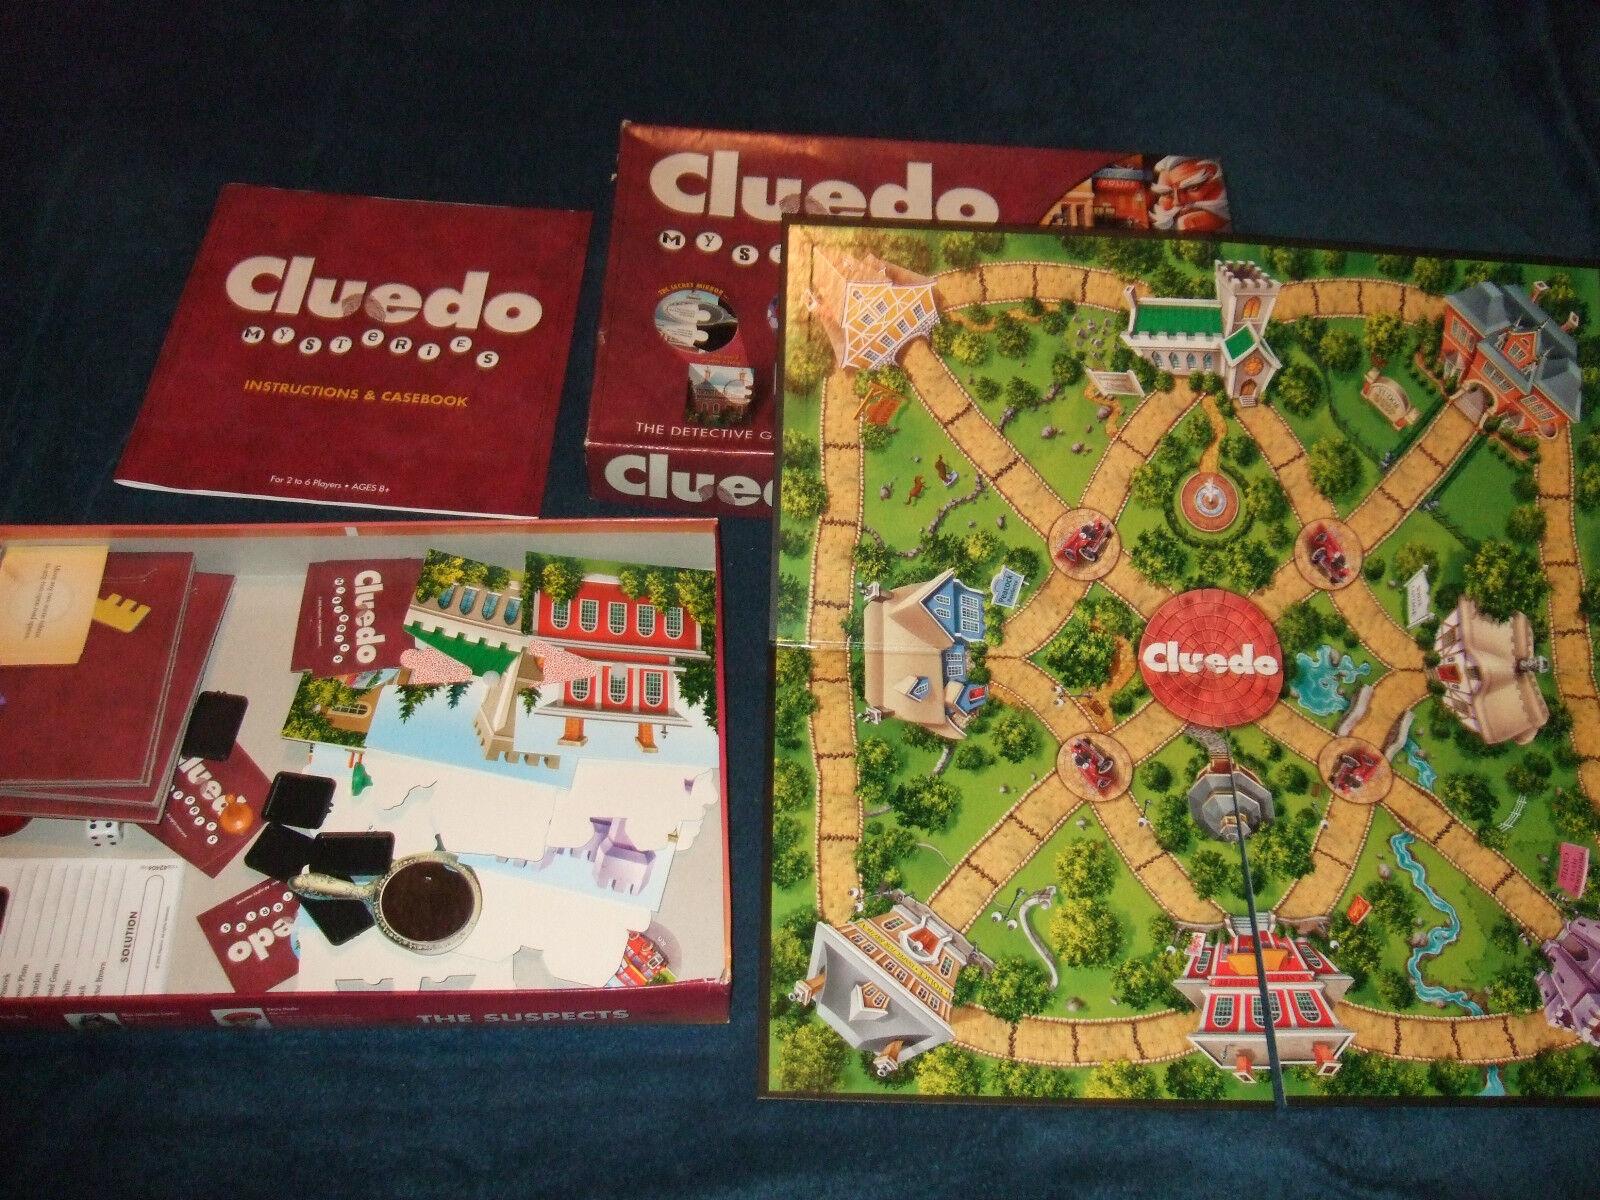 CLUEDO CLUEDO CLUEDO MYSTERIES--FAMILY BOARD GAME BY PARKER 2006 503a81